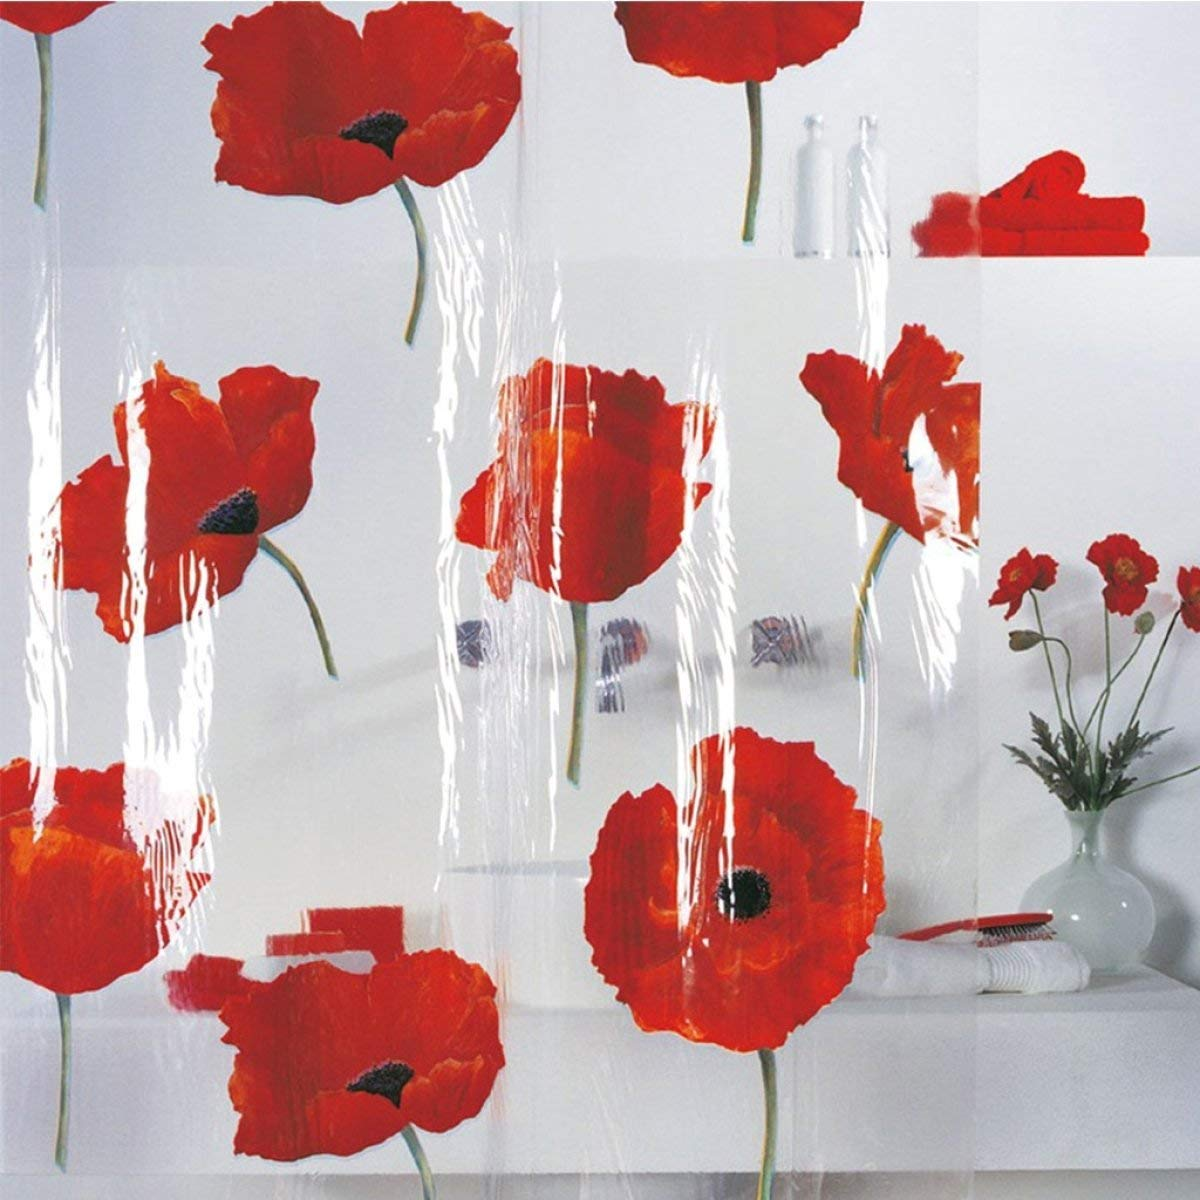 Der Europe Creative PVC Petal Screen Transparent Curtain Waterproof and Mildew Thickened Clean Bathroom Shower Curtain Bathroom Accessories